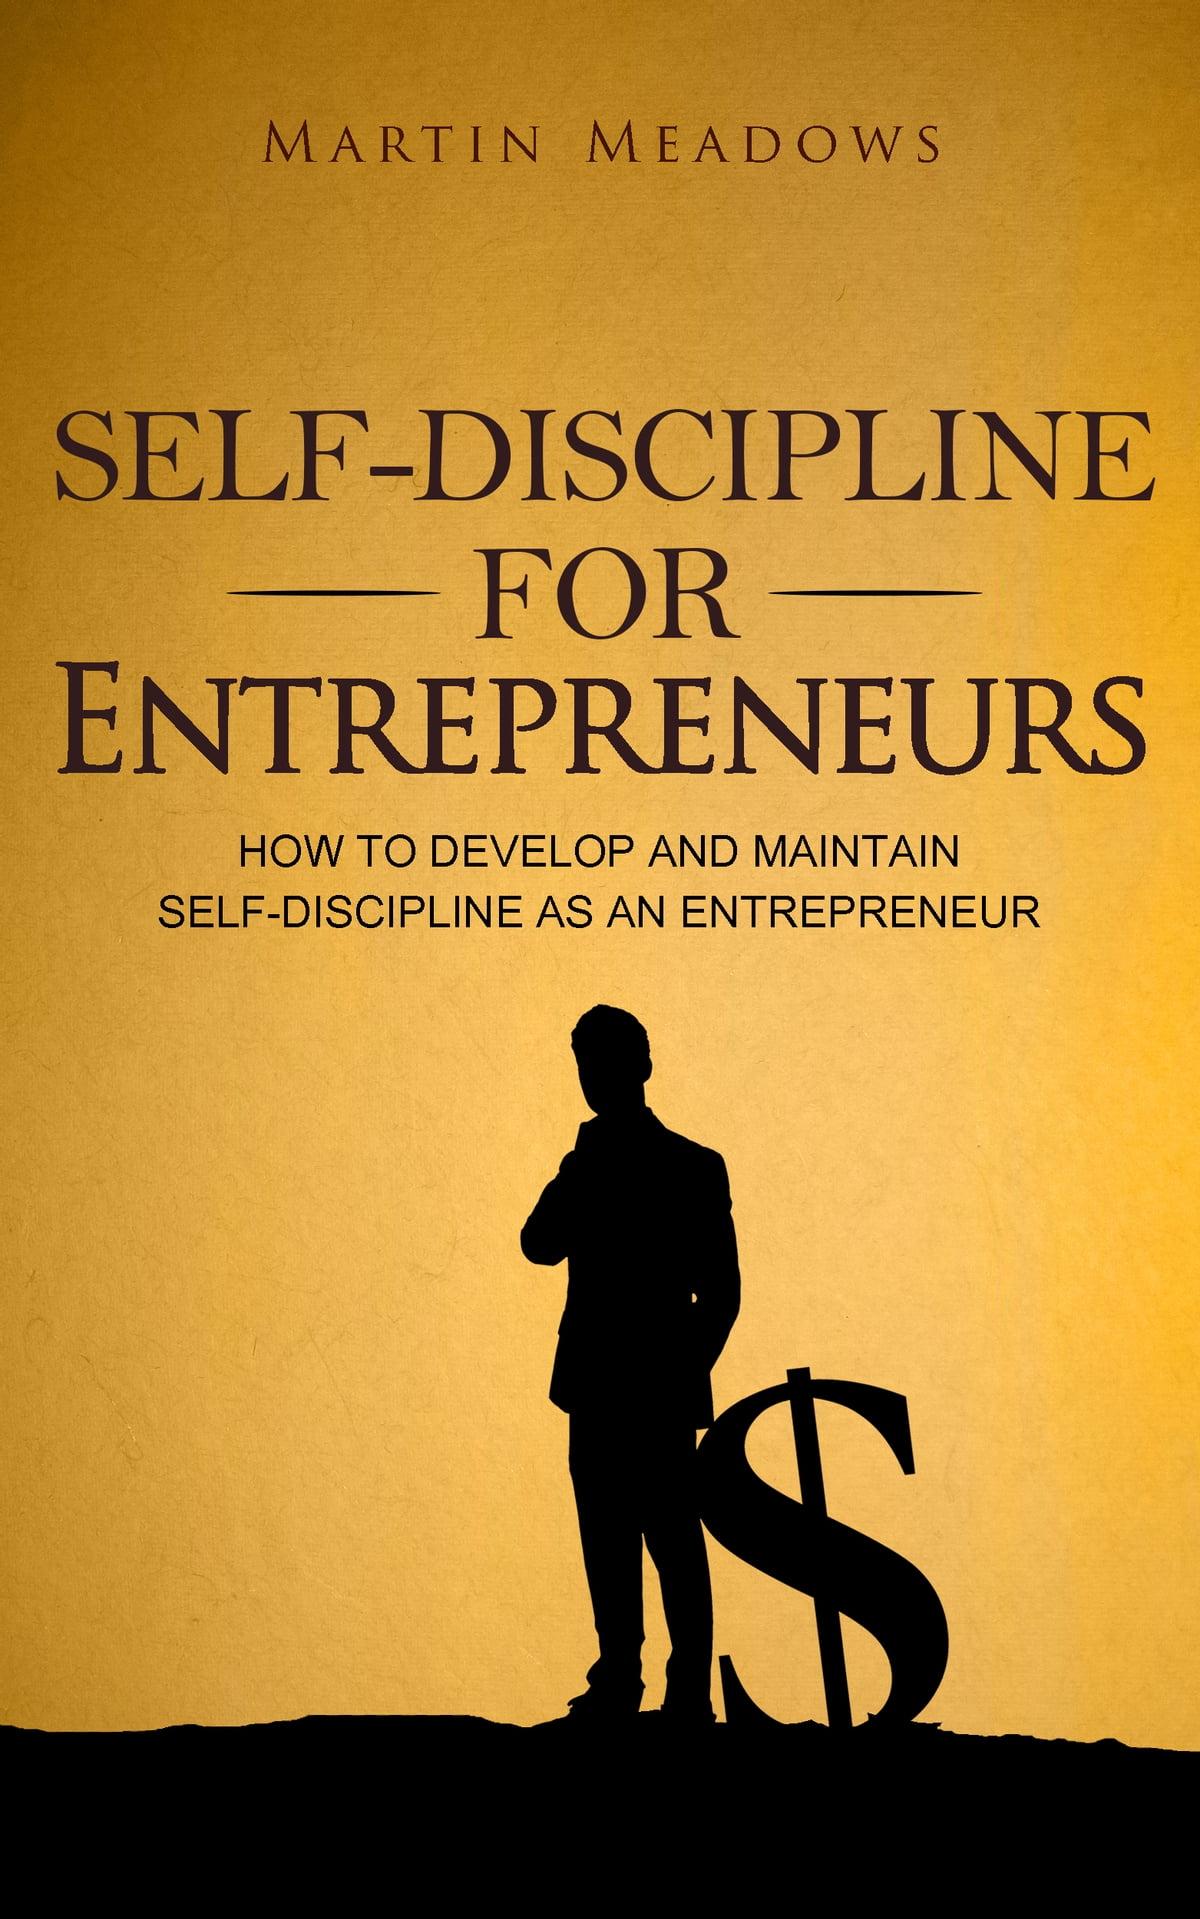 Self-Discipline for Entrepreneurs eBook by Martin Meadows - 1230001362183   Rakuten Kobo United States